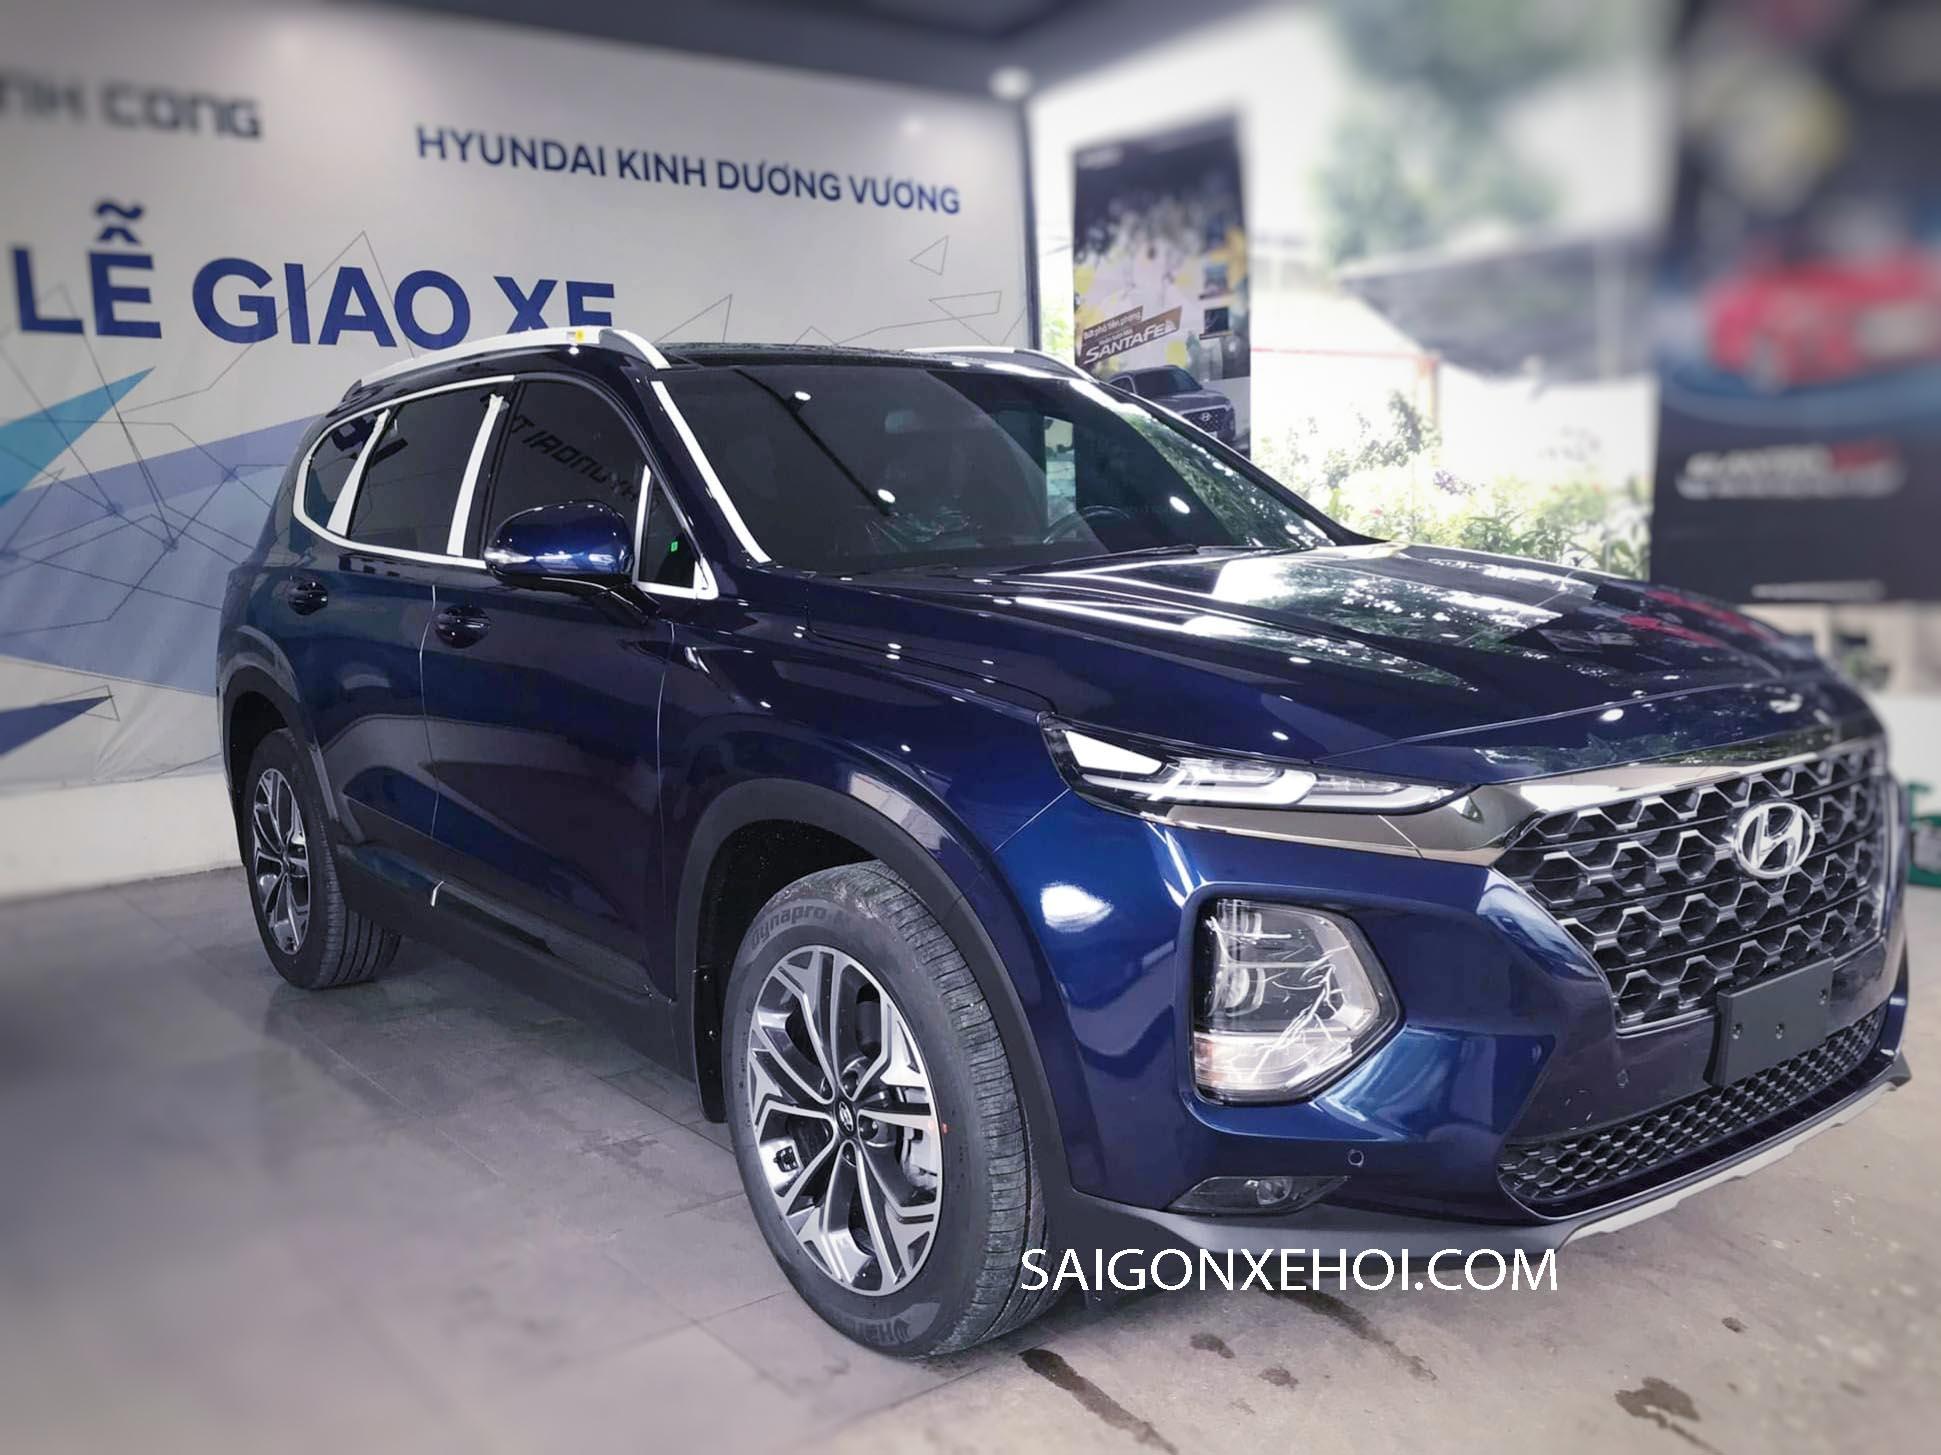 Có nên mua Thân xe Hyundai Santafe 2020